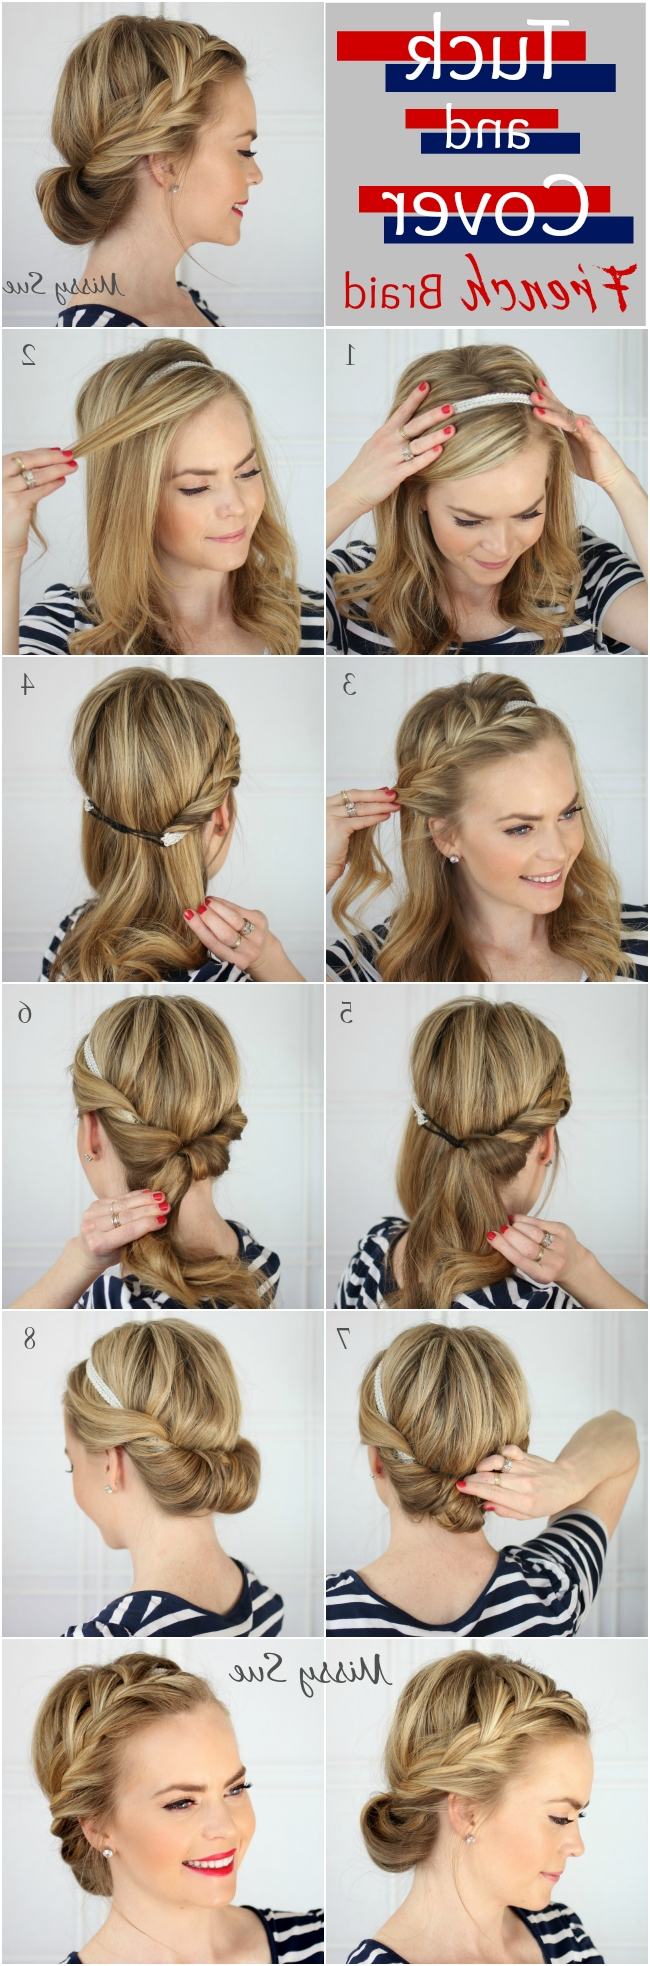 Trendy Diy Wedding Updos For Long Hair In 10 Best Diy Wedding Hairstyles With Tutorials (View 9 of 15)